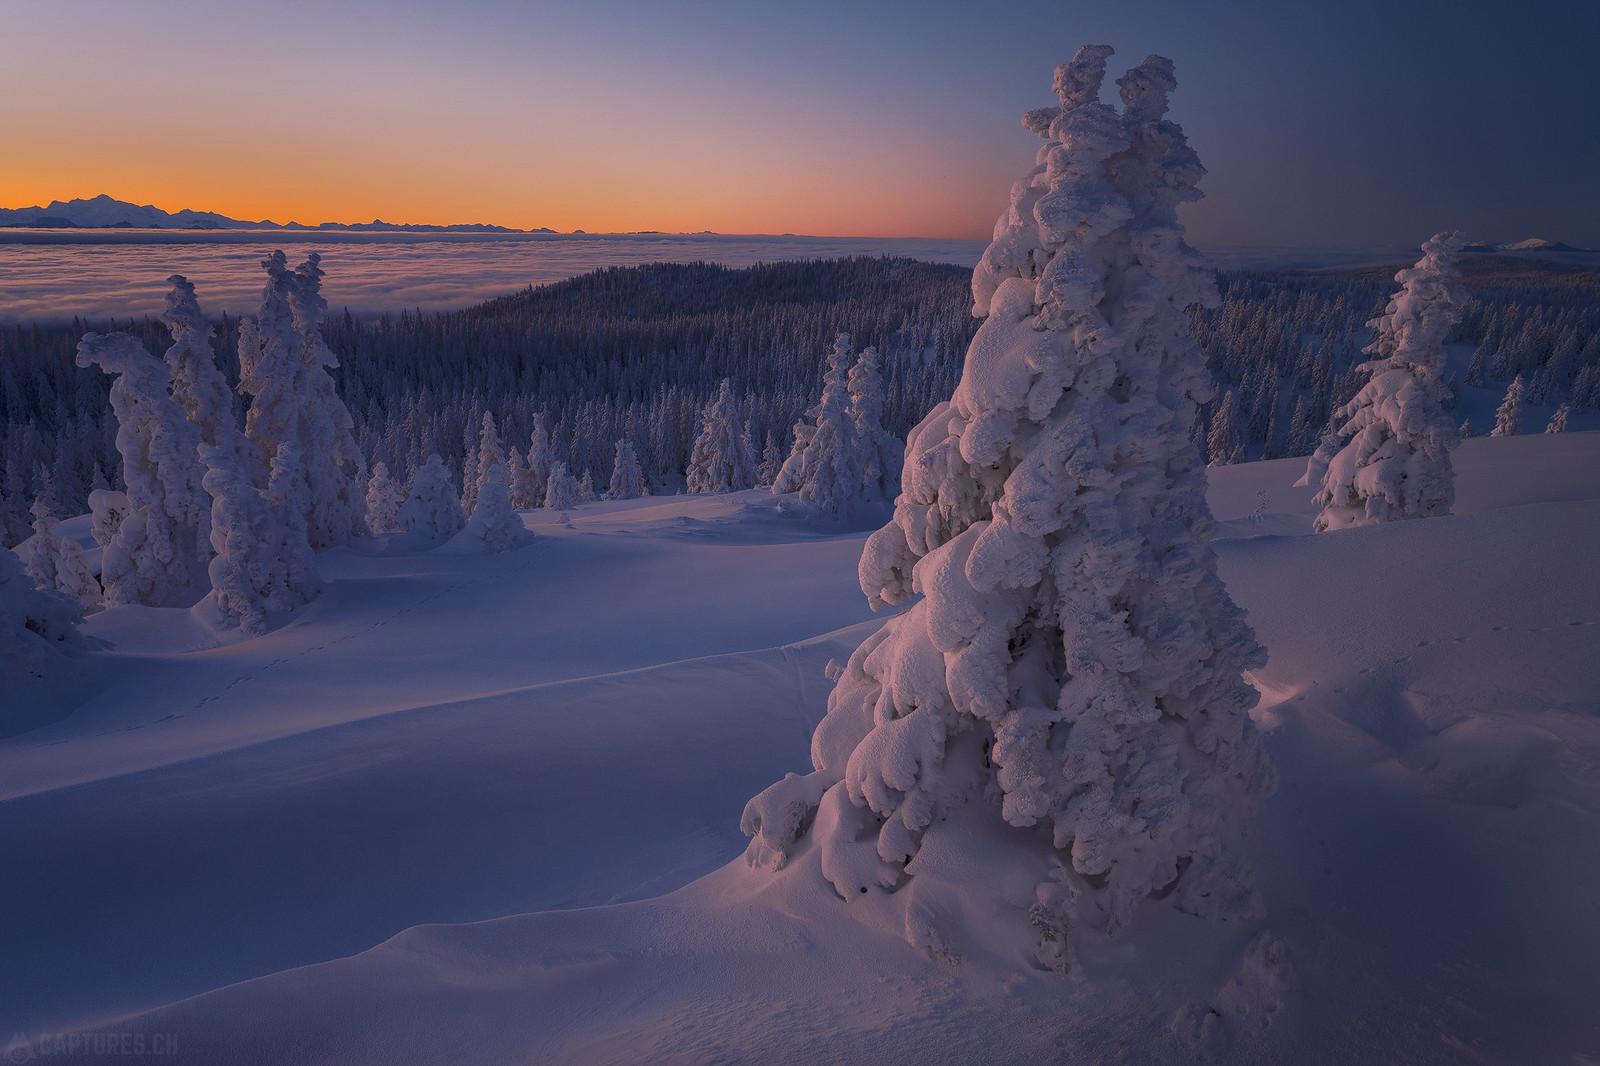 Frozen trees 3 - Jura